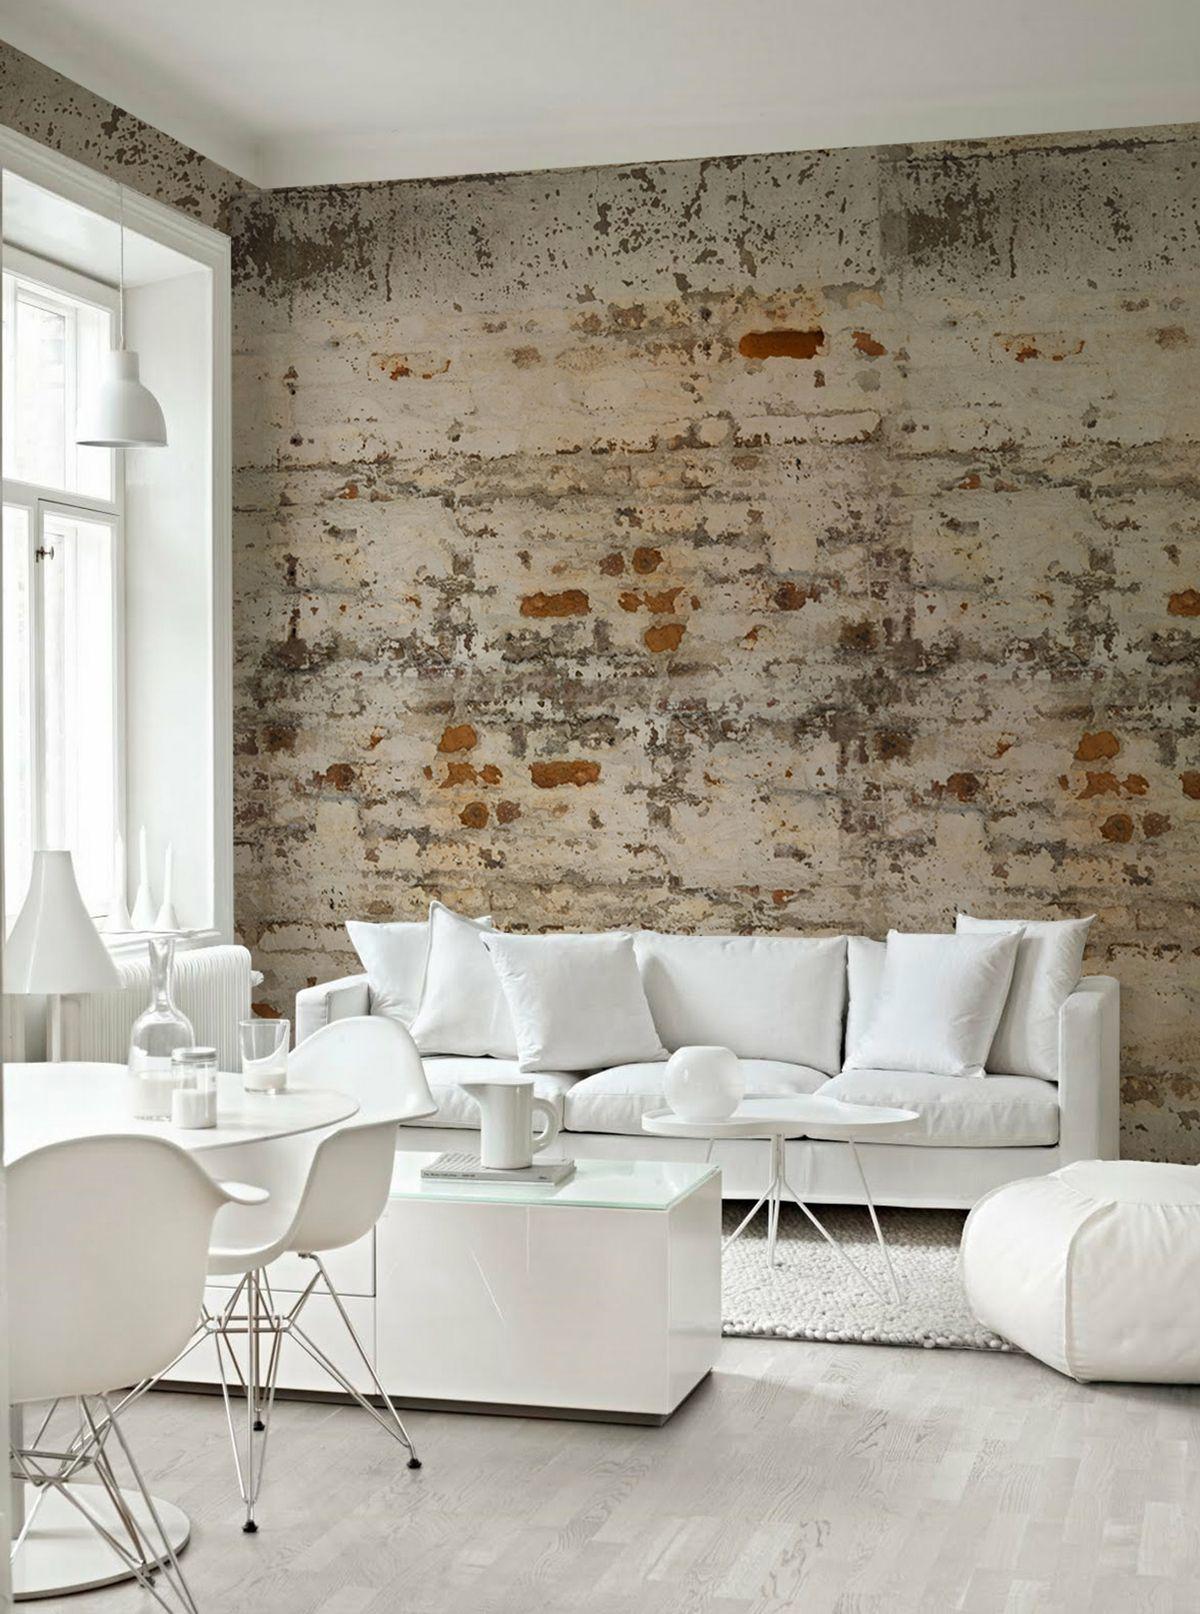 Natur Wand #Hausbau Tapeten Wohnzimmer Modern, Haus Studio, Kontrast,  Hausbau, Steinwand